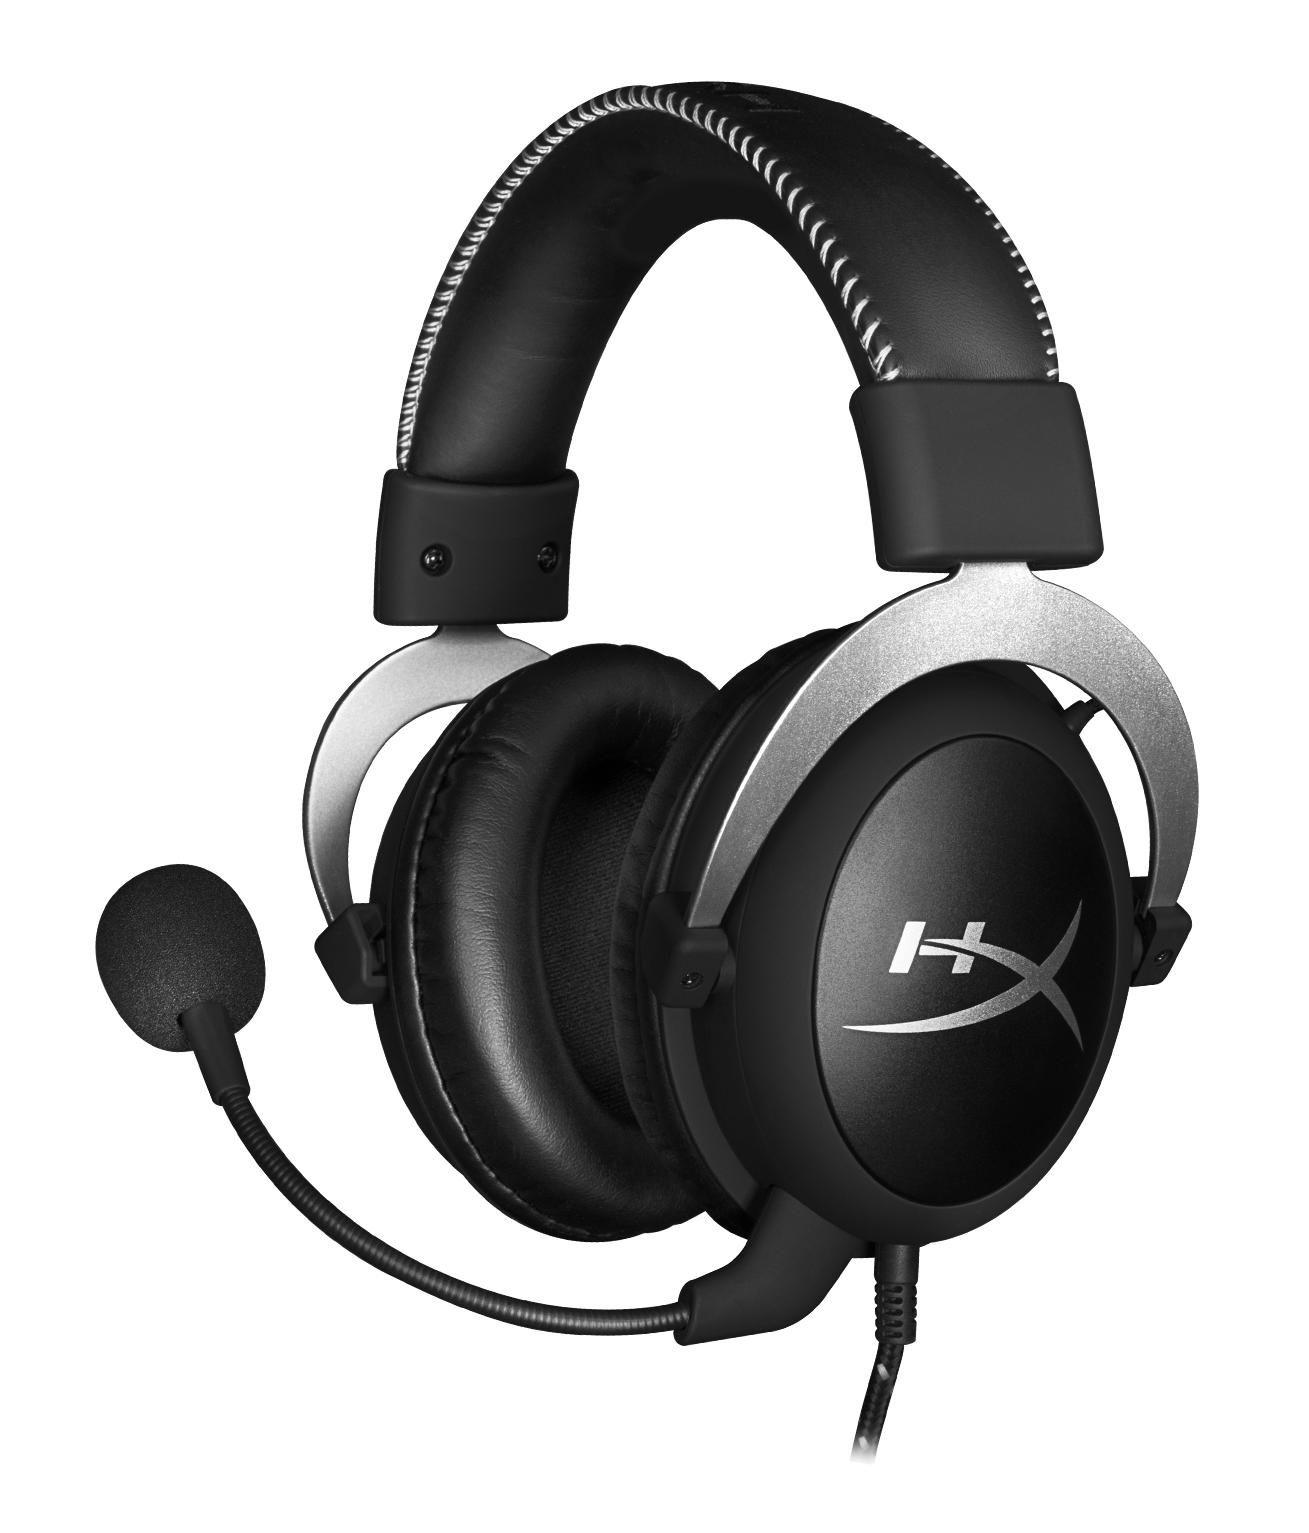 HyperX Cloud Pro Headset Hoofdband 3,5mm-connector Zwart, Zilver